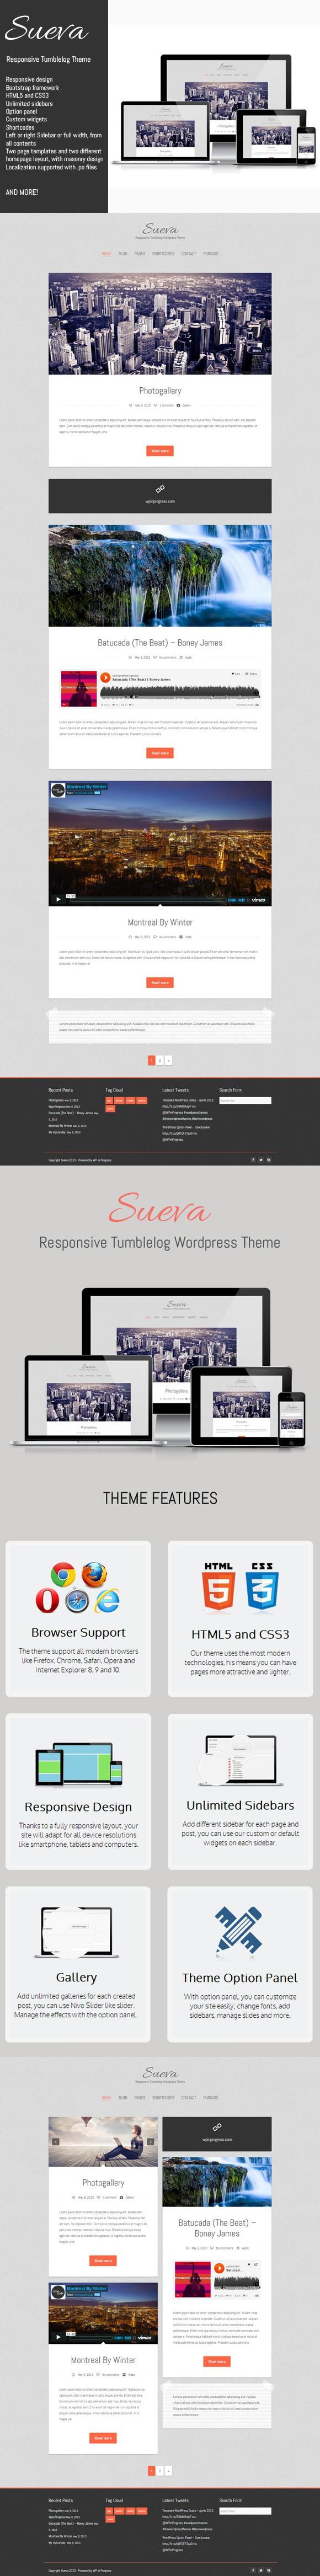 Sueva - Responsive Tumbelog Theme. Bootstrap Templates. $55.00 ...